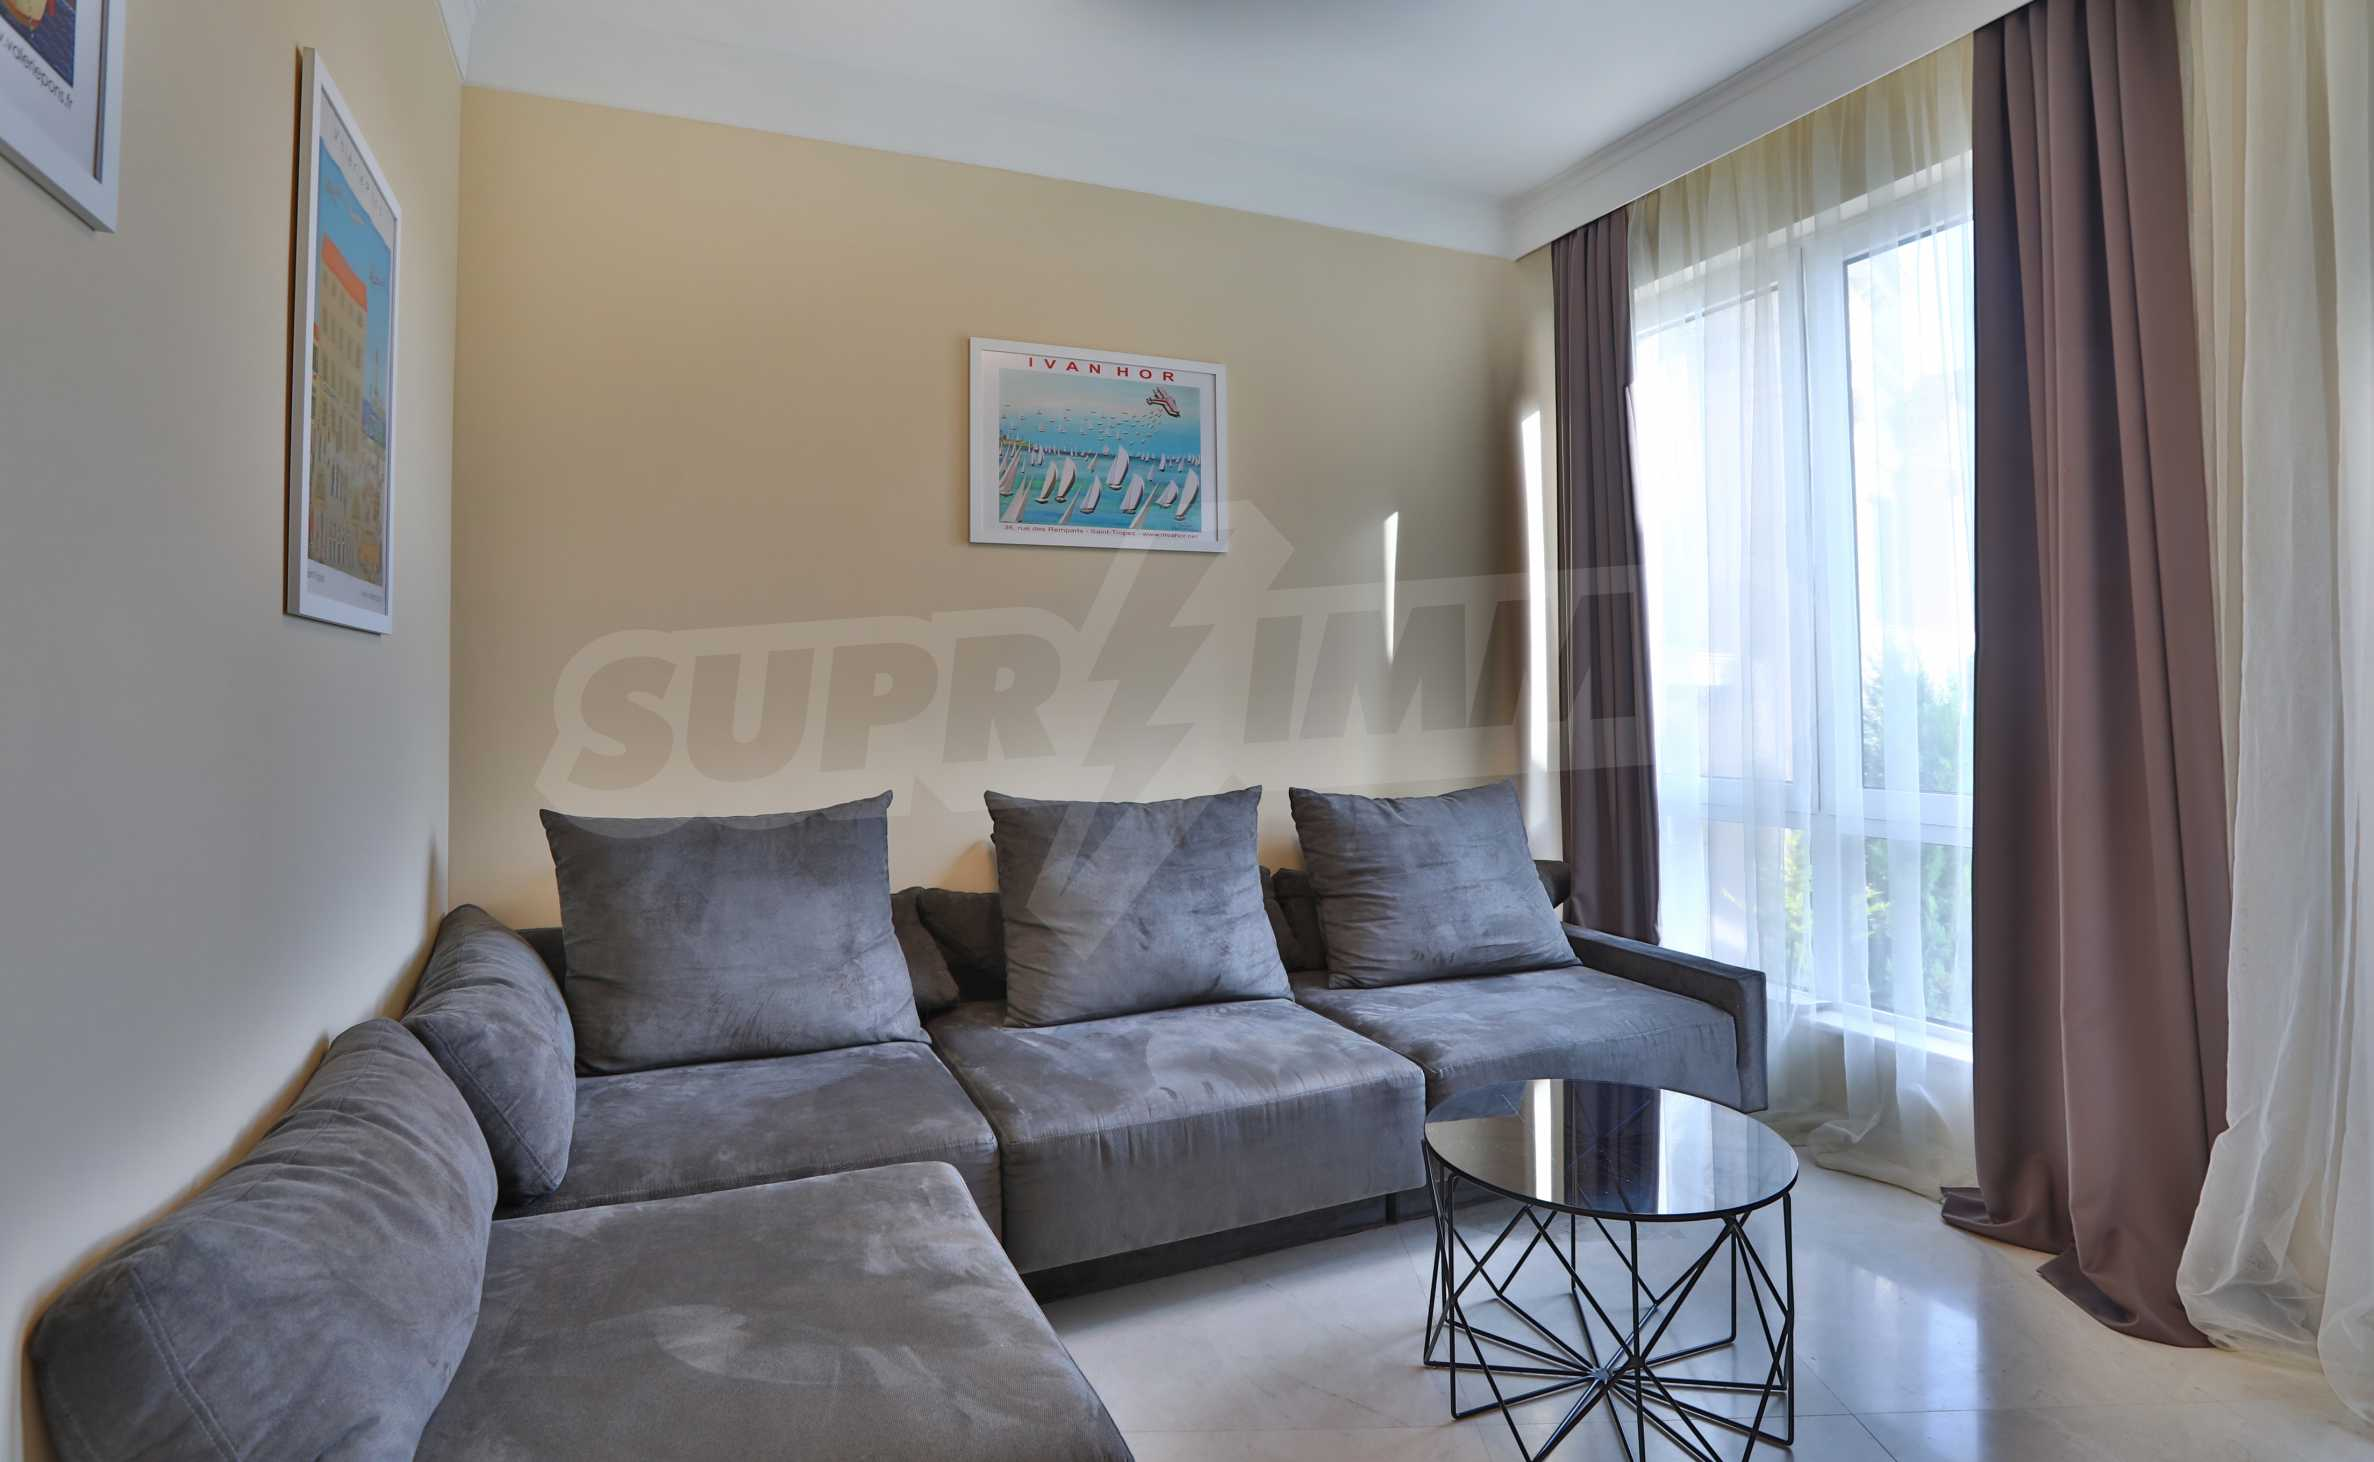 Exclusive 2-bedroom beachfront apartment in the prestigious Belle Époque Beach Residence 4